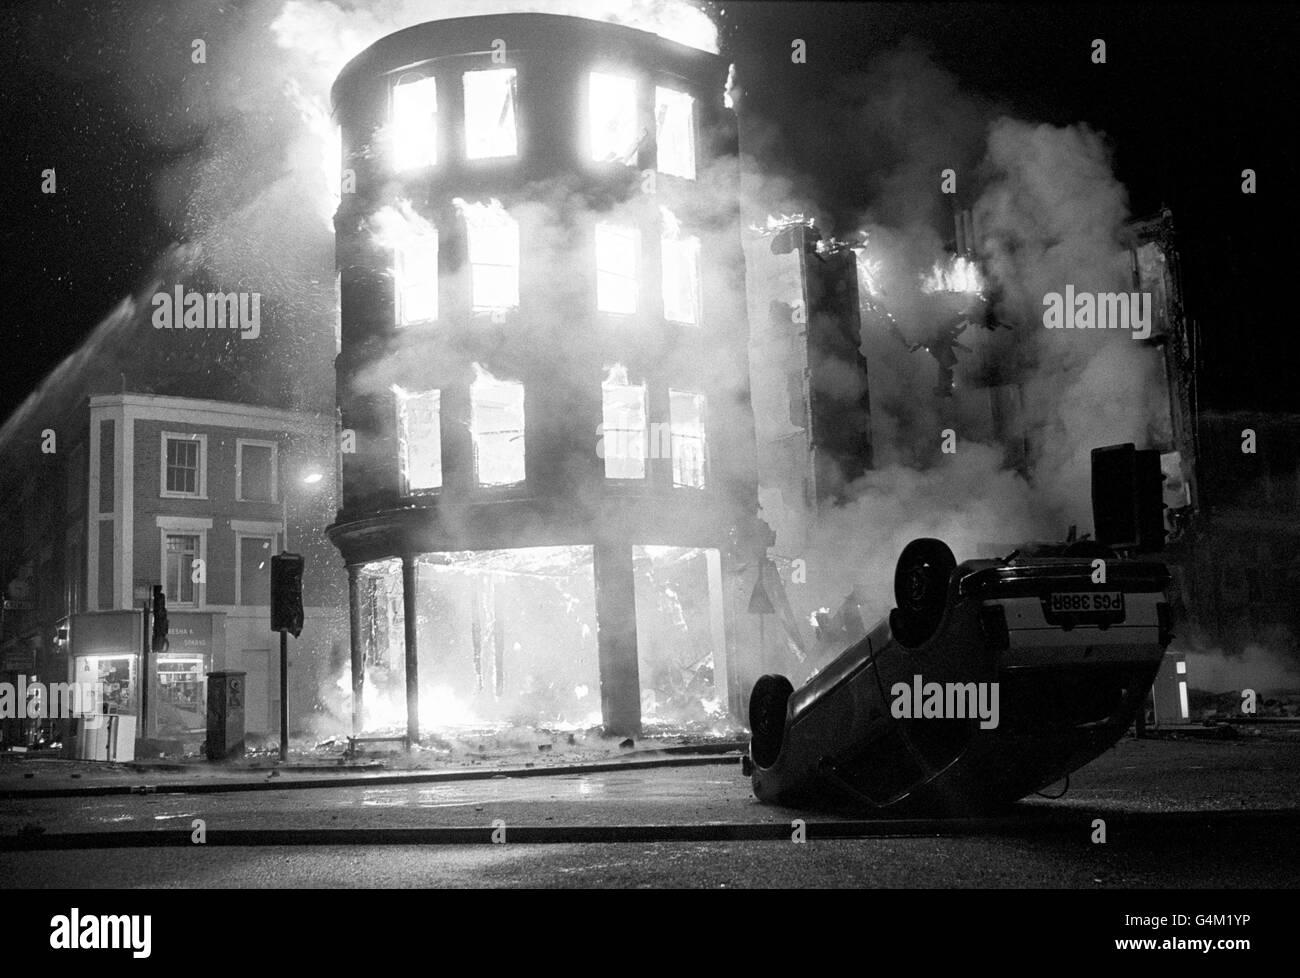 British Crime - Civil Disturbance - The Brixton Riots - London - 1985 - Stock Image